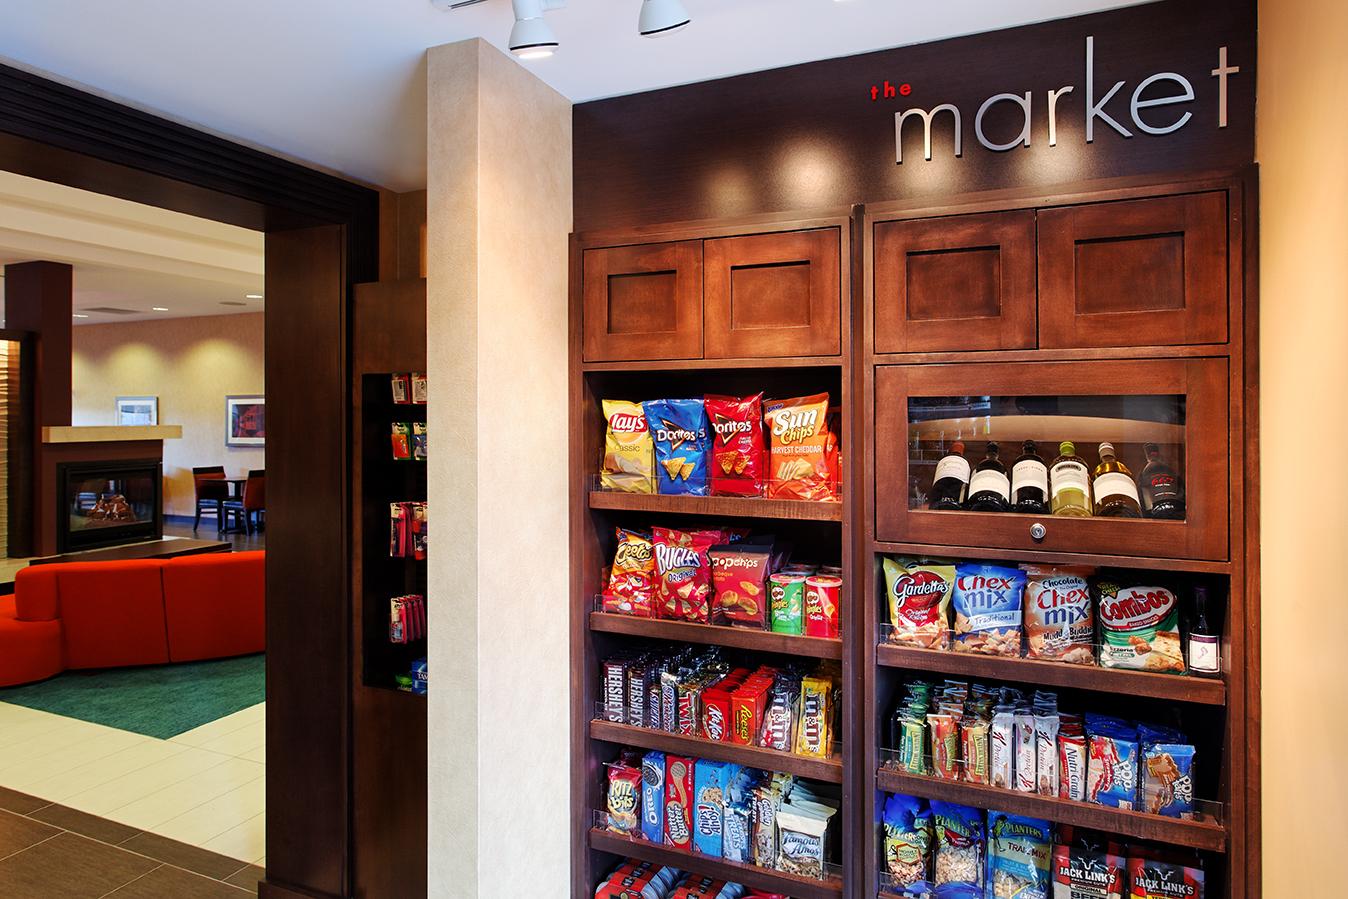 Residence Inn Marriott Lpbc Atlanta Architecture